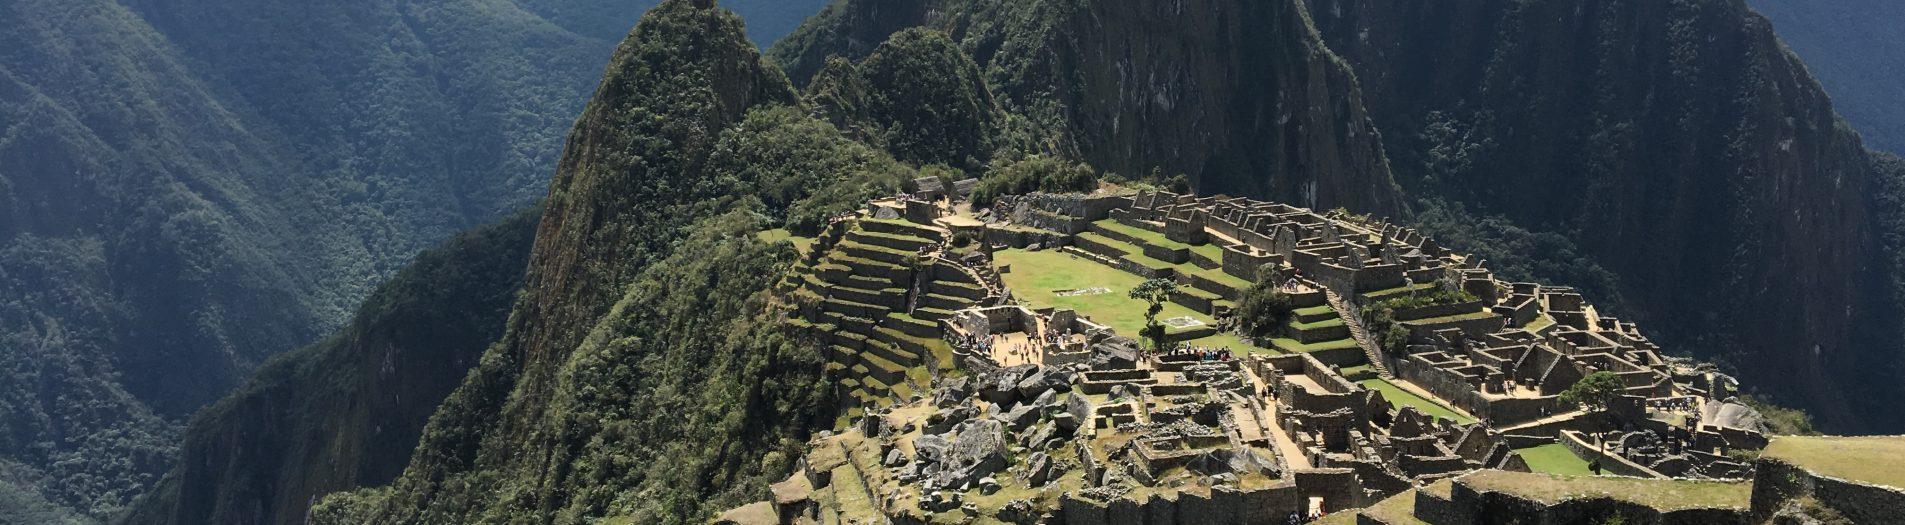 Travel Peru: My journey through pictures